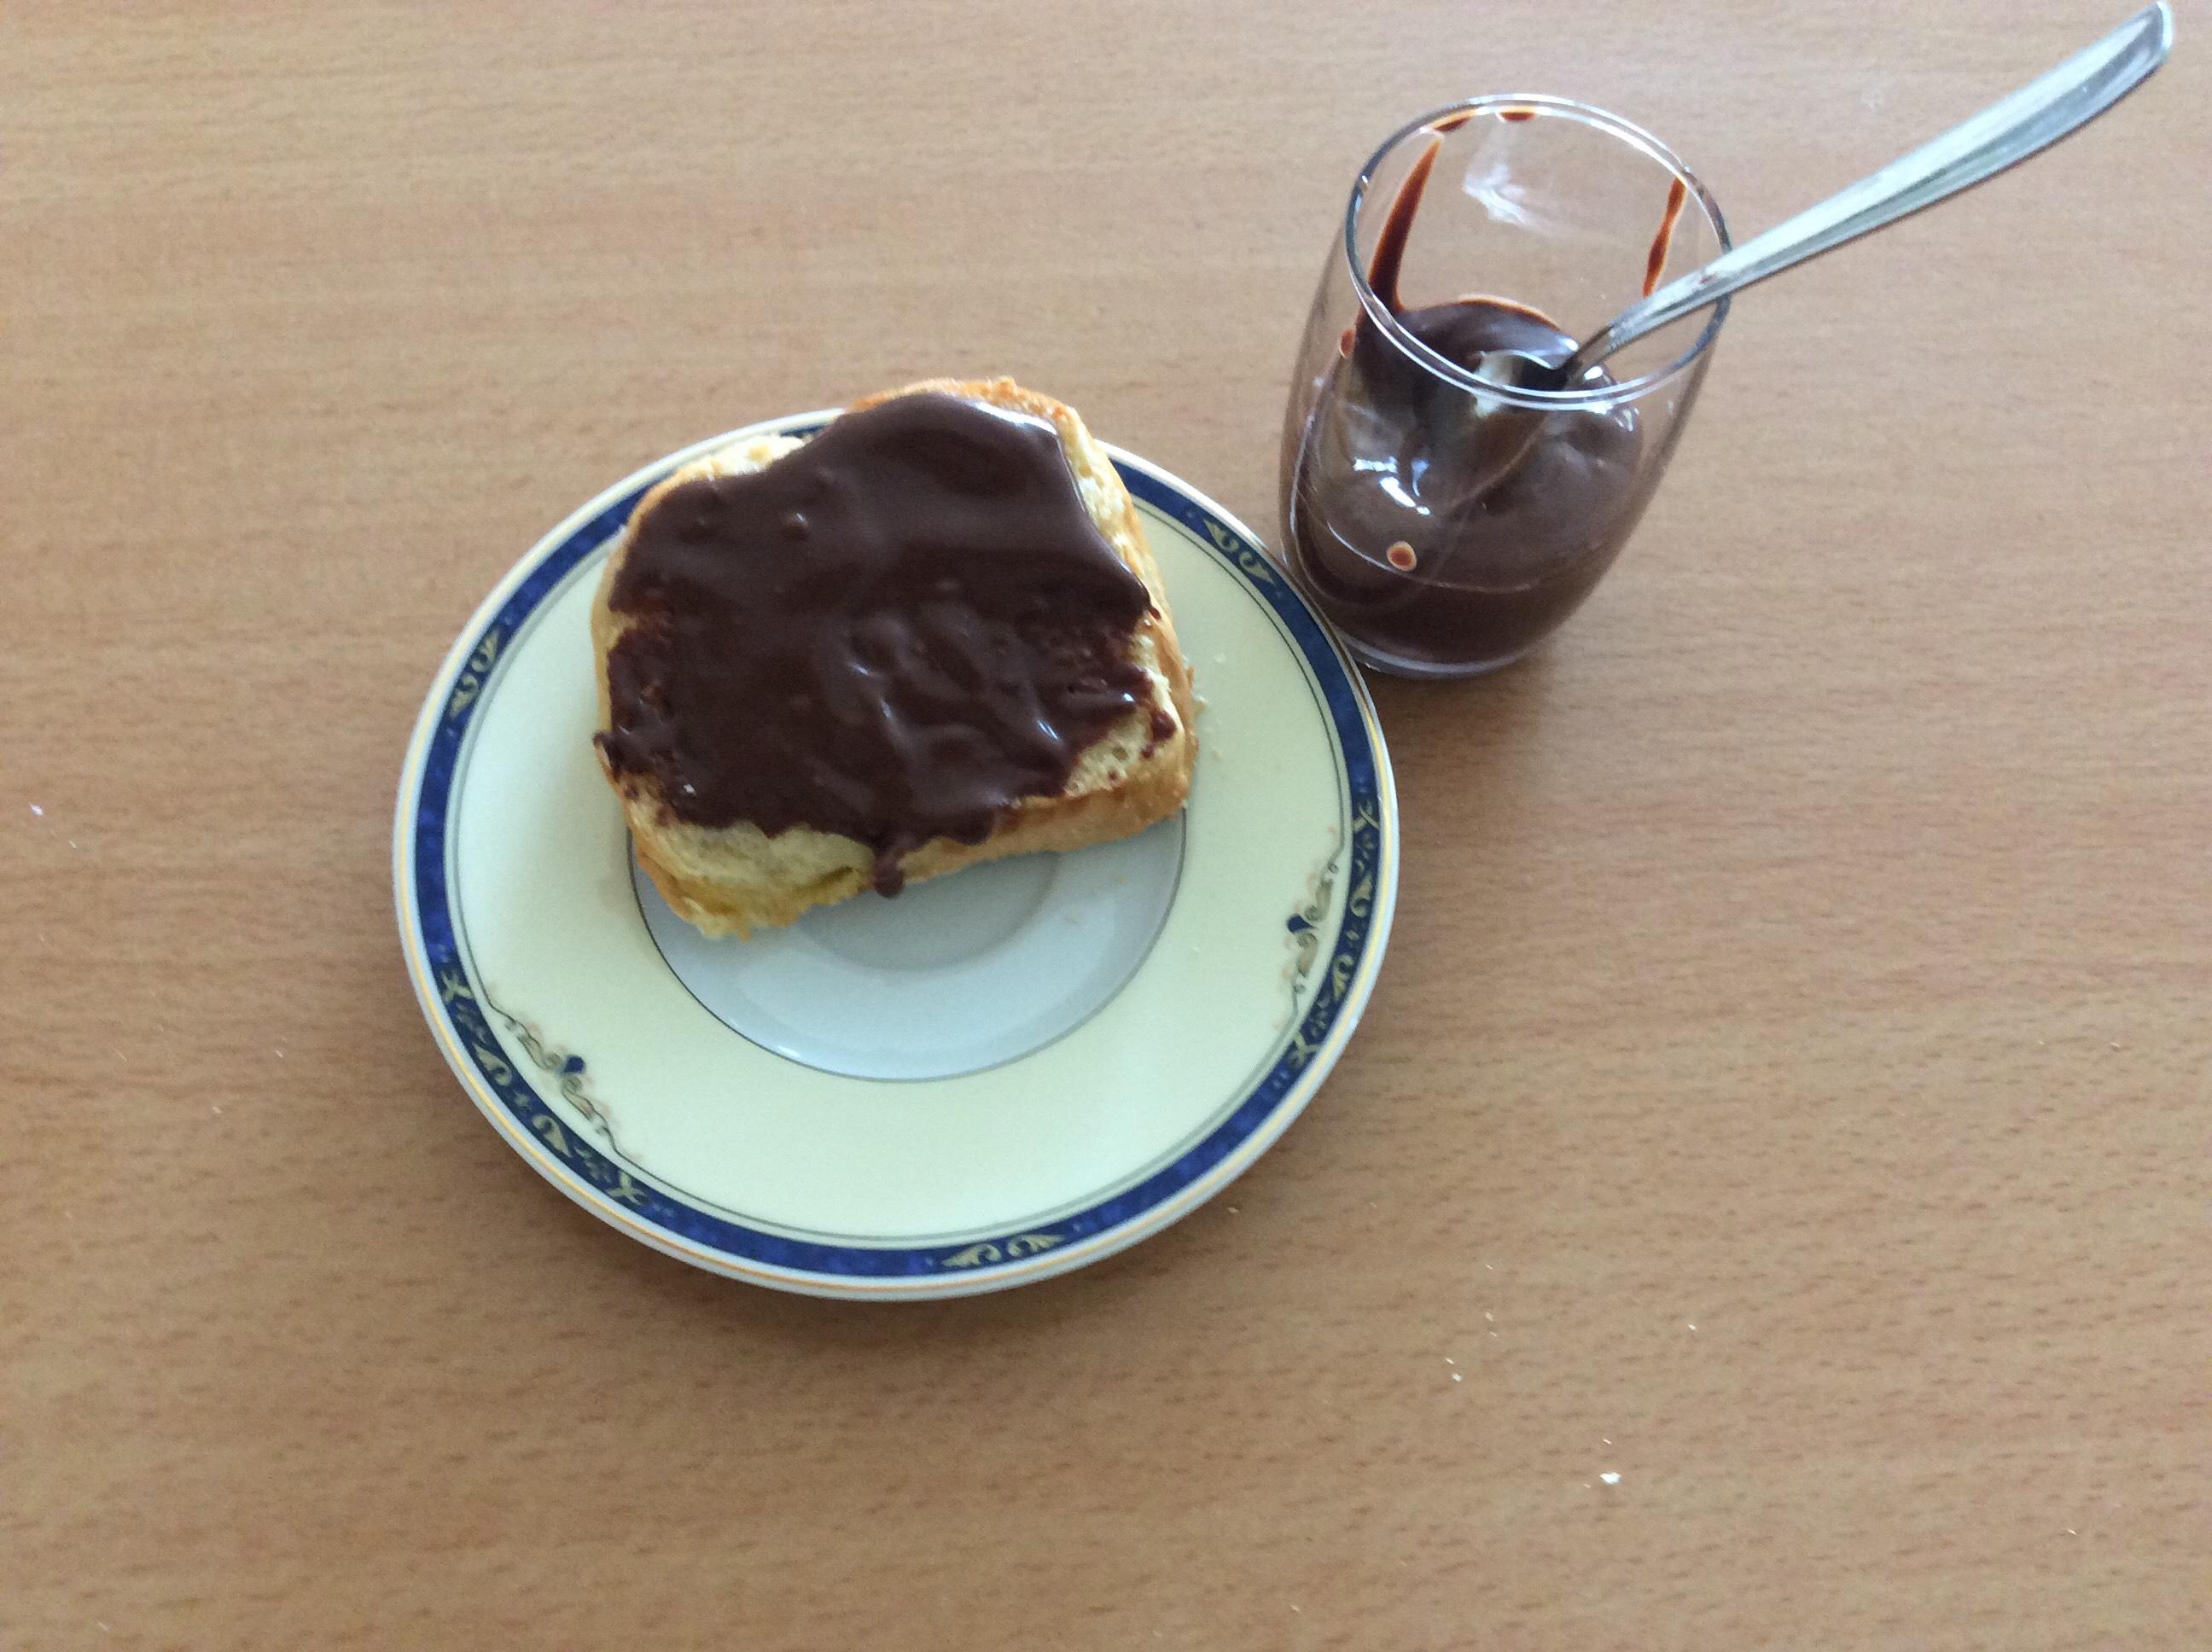 How To Make DIY Chocolat Spread